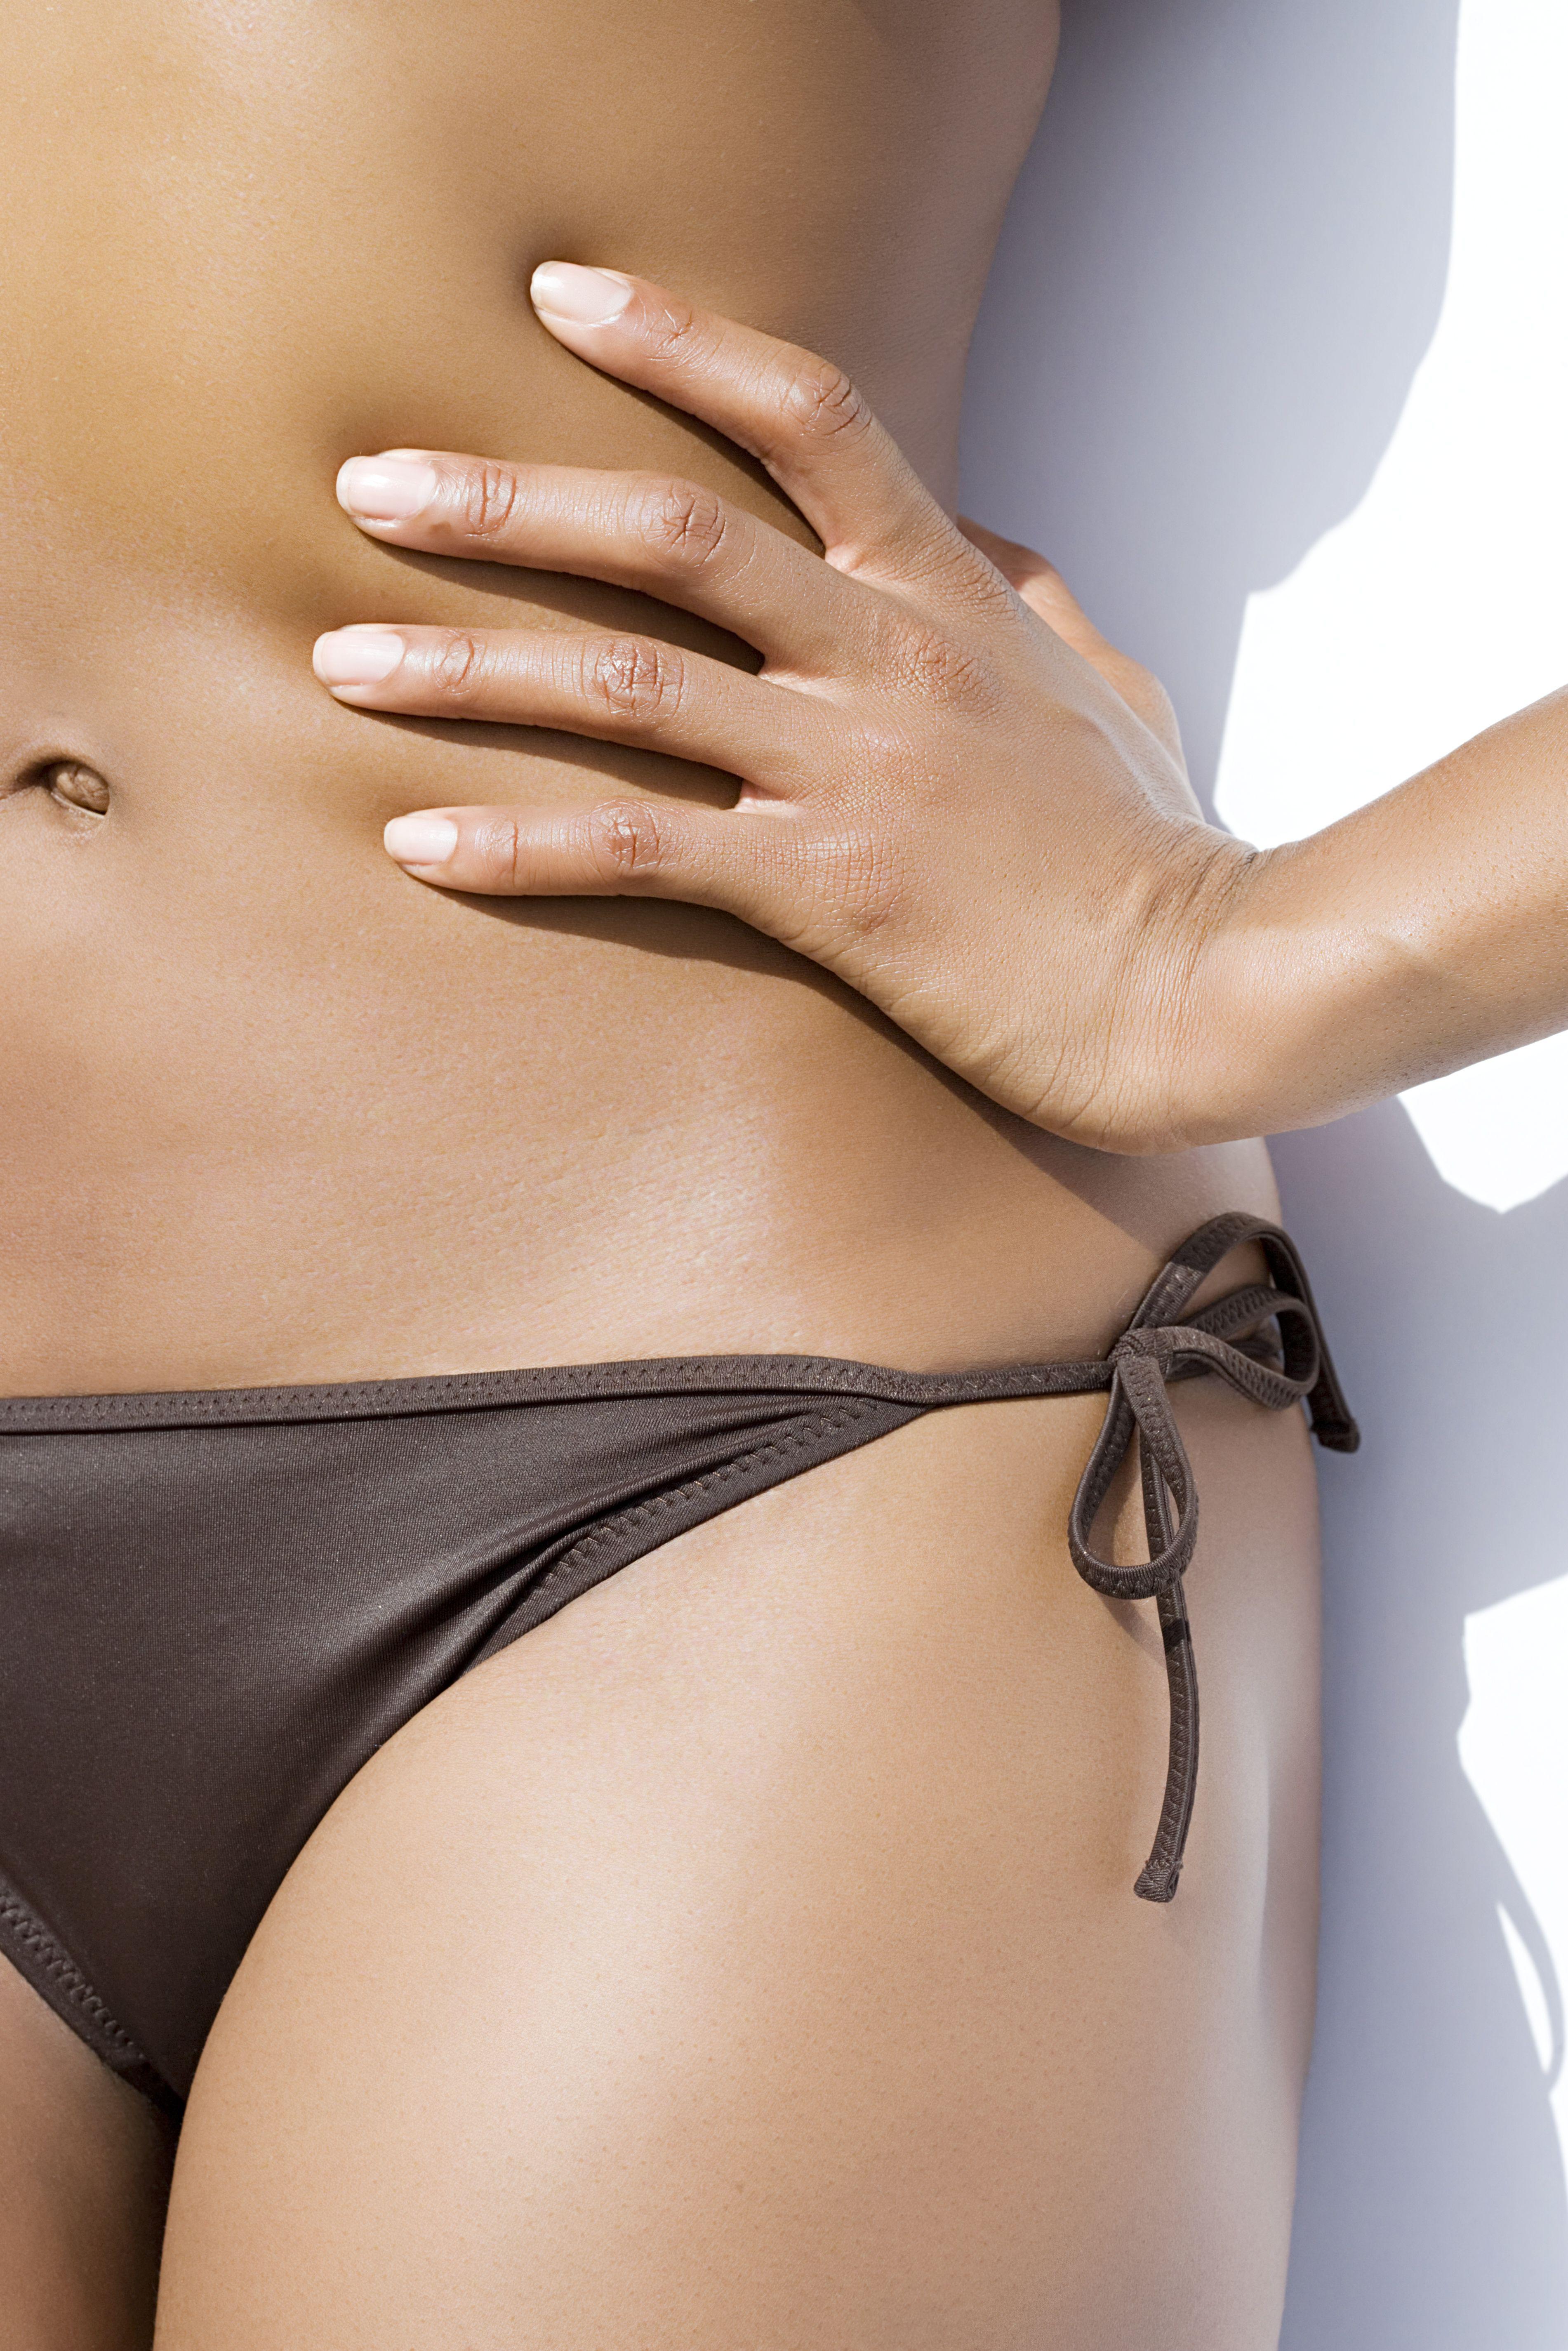 Pics and galleries Hot girlfriend prostate handjob